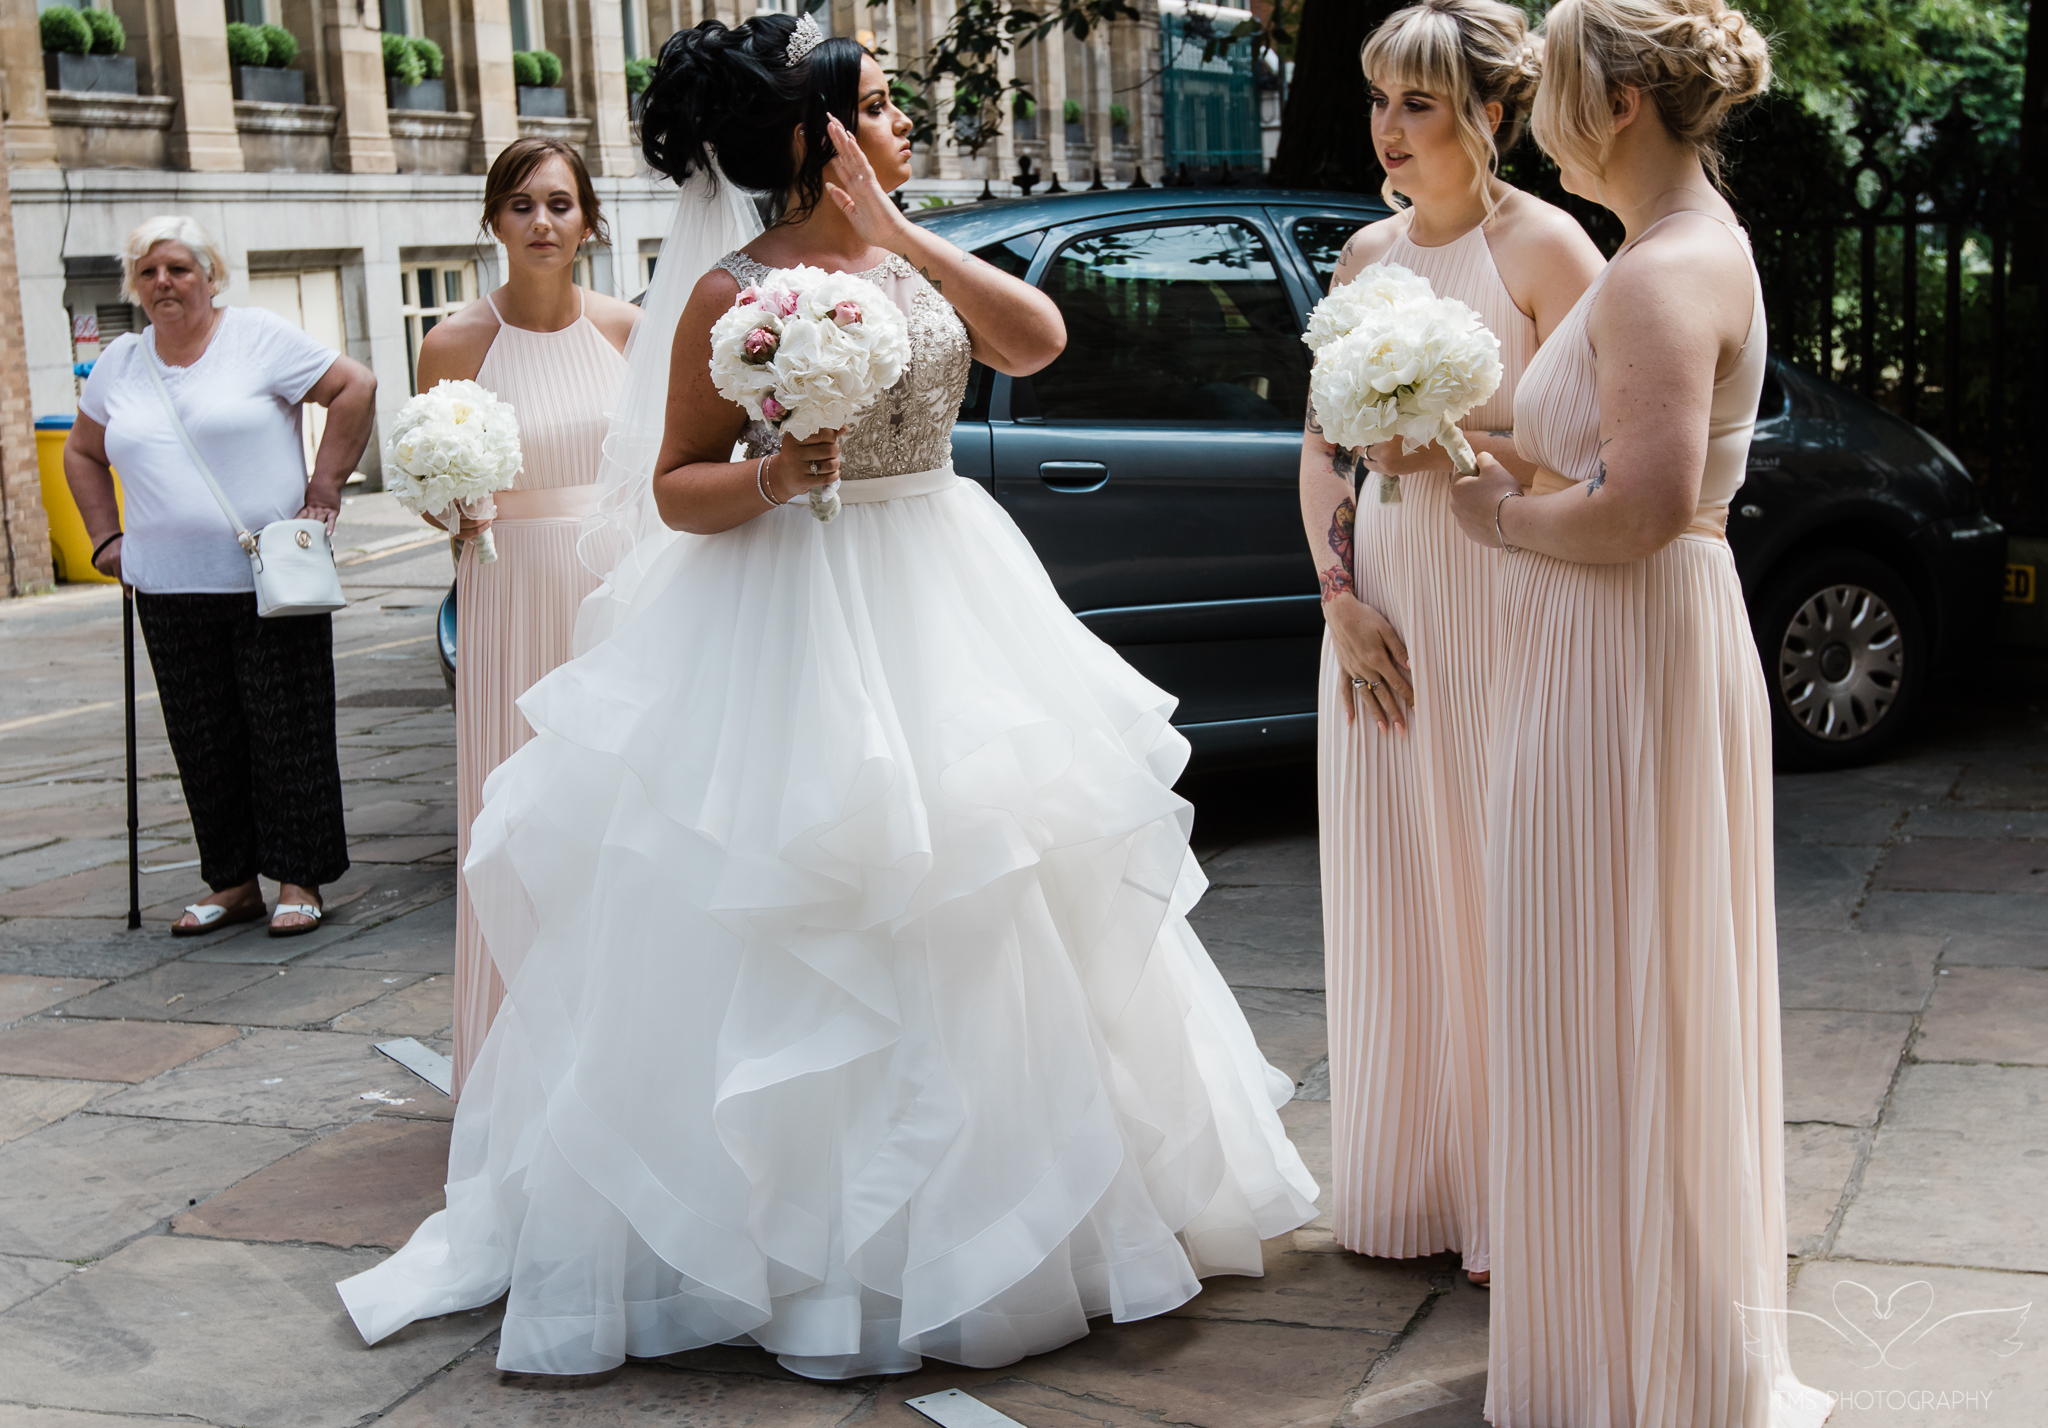 Wedding_photography_Hilton_liverpool_Albertdocks-69